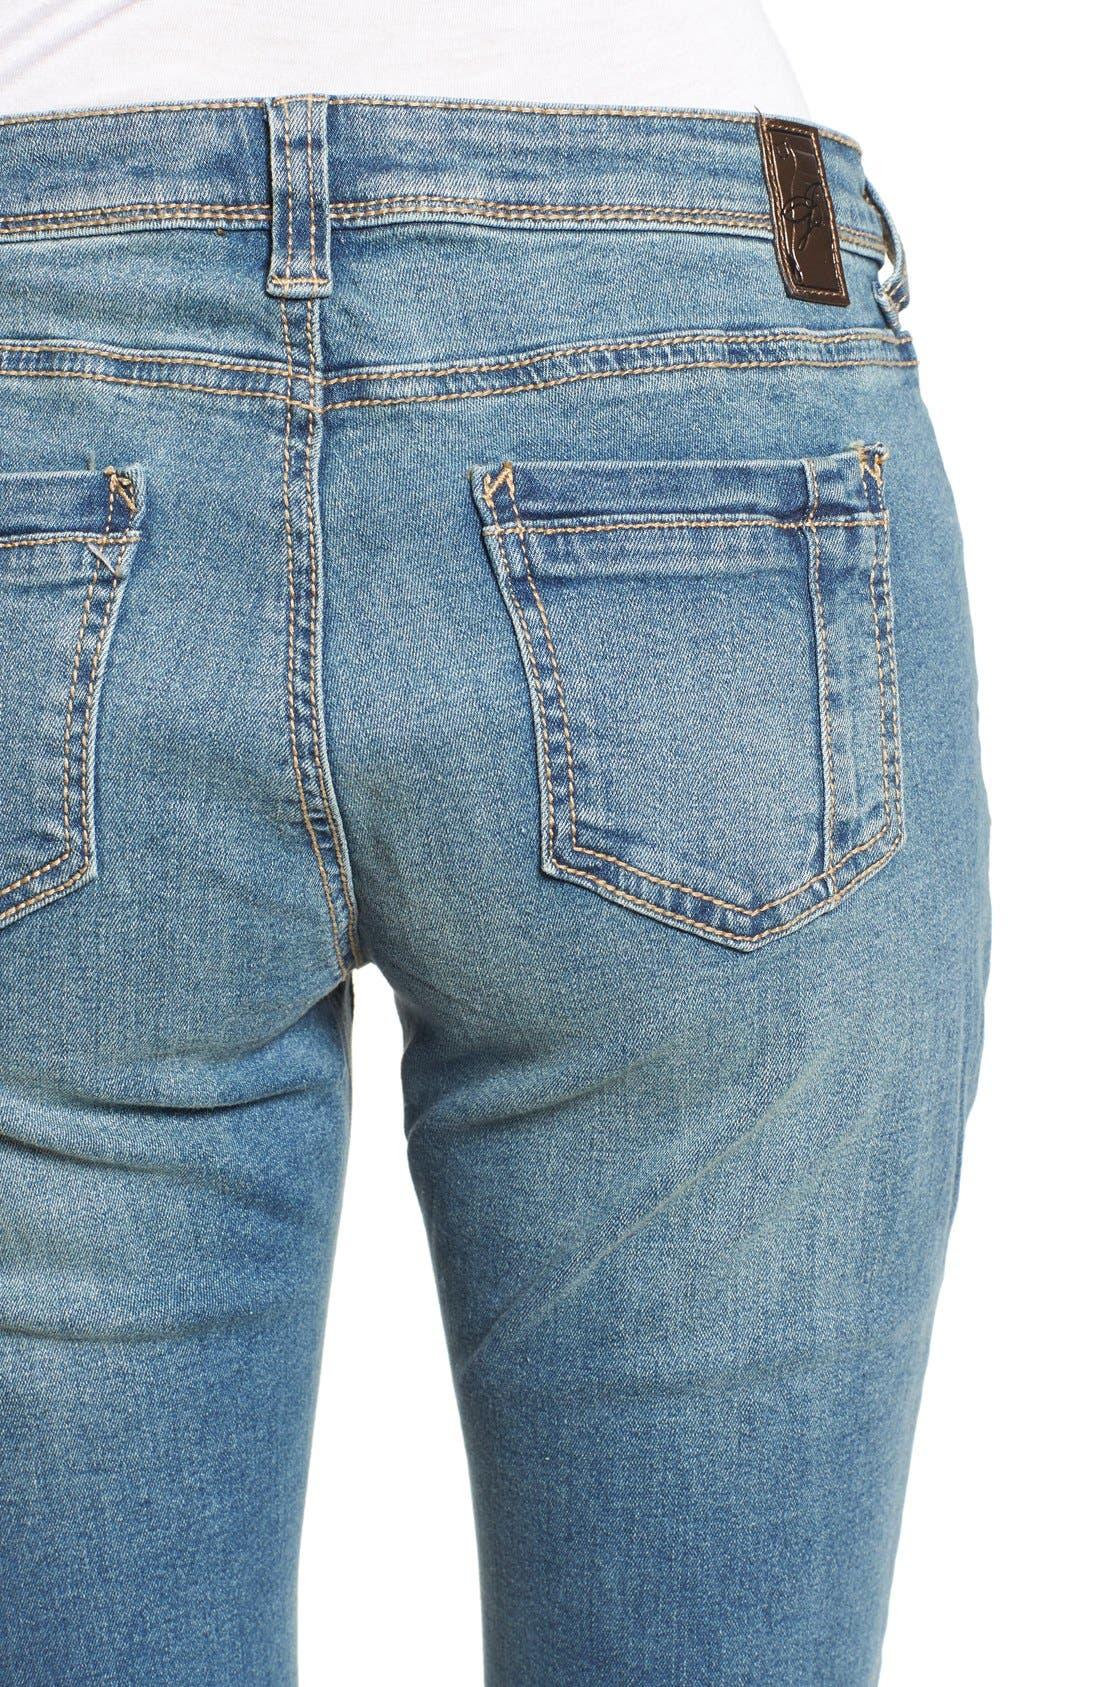 Alternate Image 4  - Poetic Justice 'Maya' Distressed Mid Rise Skinny Jeans (Tough Love)